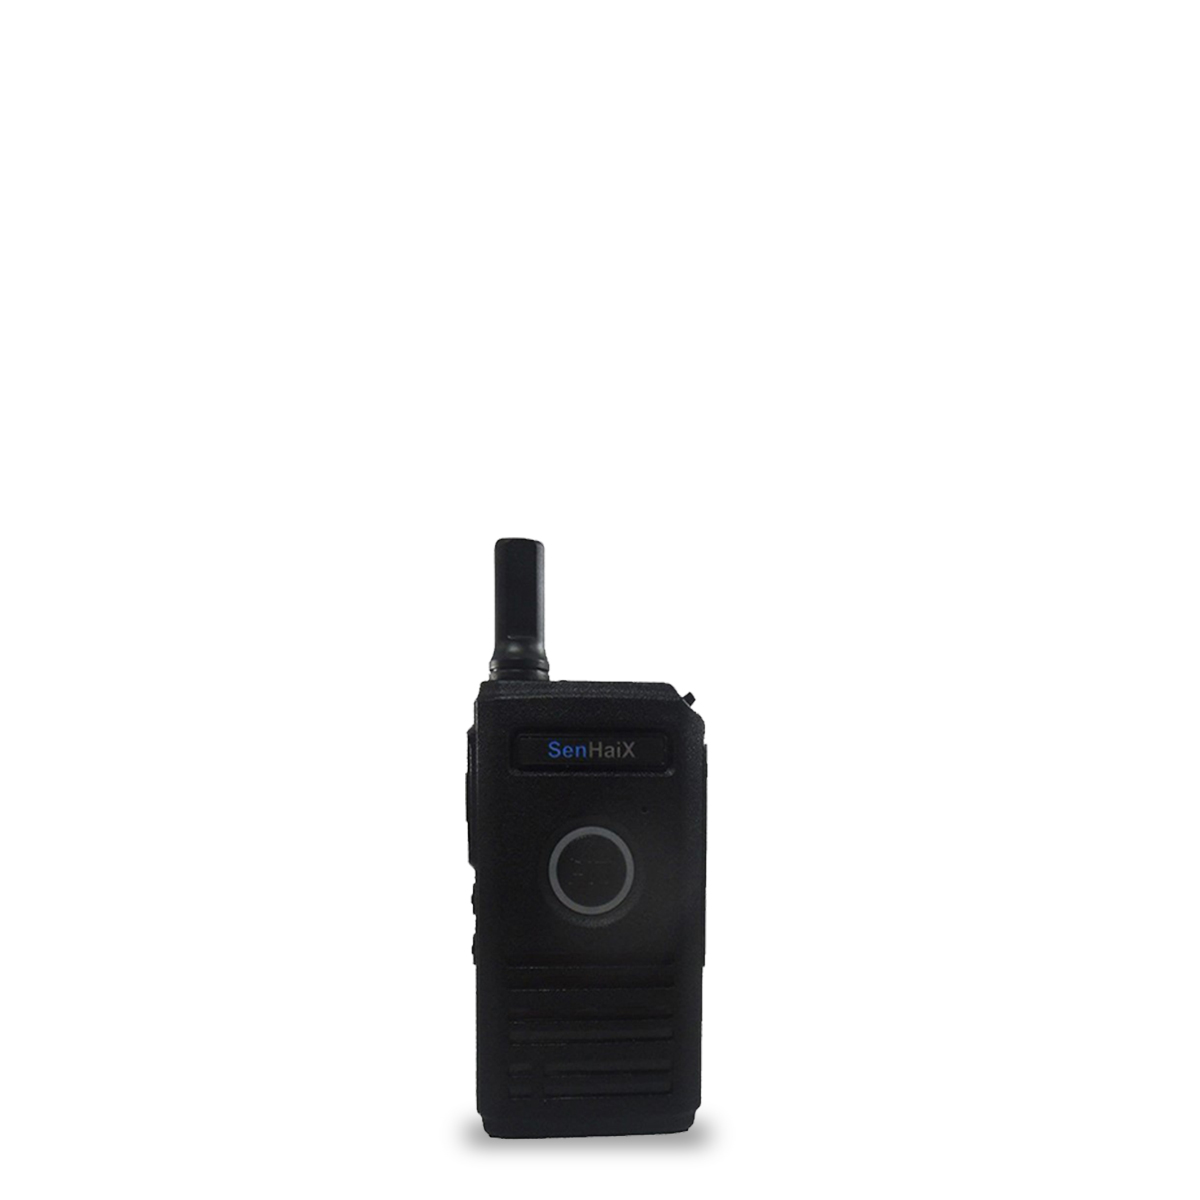 Radio SenHaiX 1430 Analógico UHF 400-470 MHz